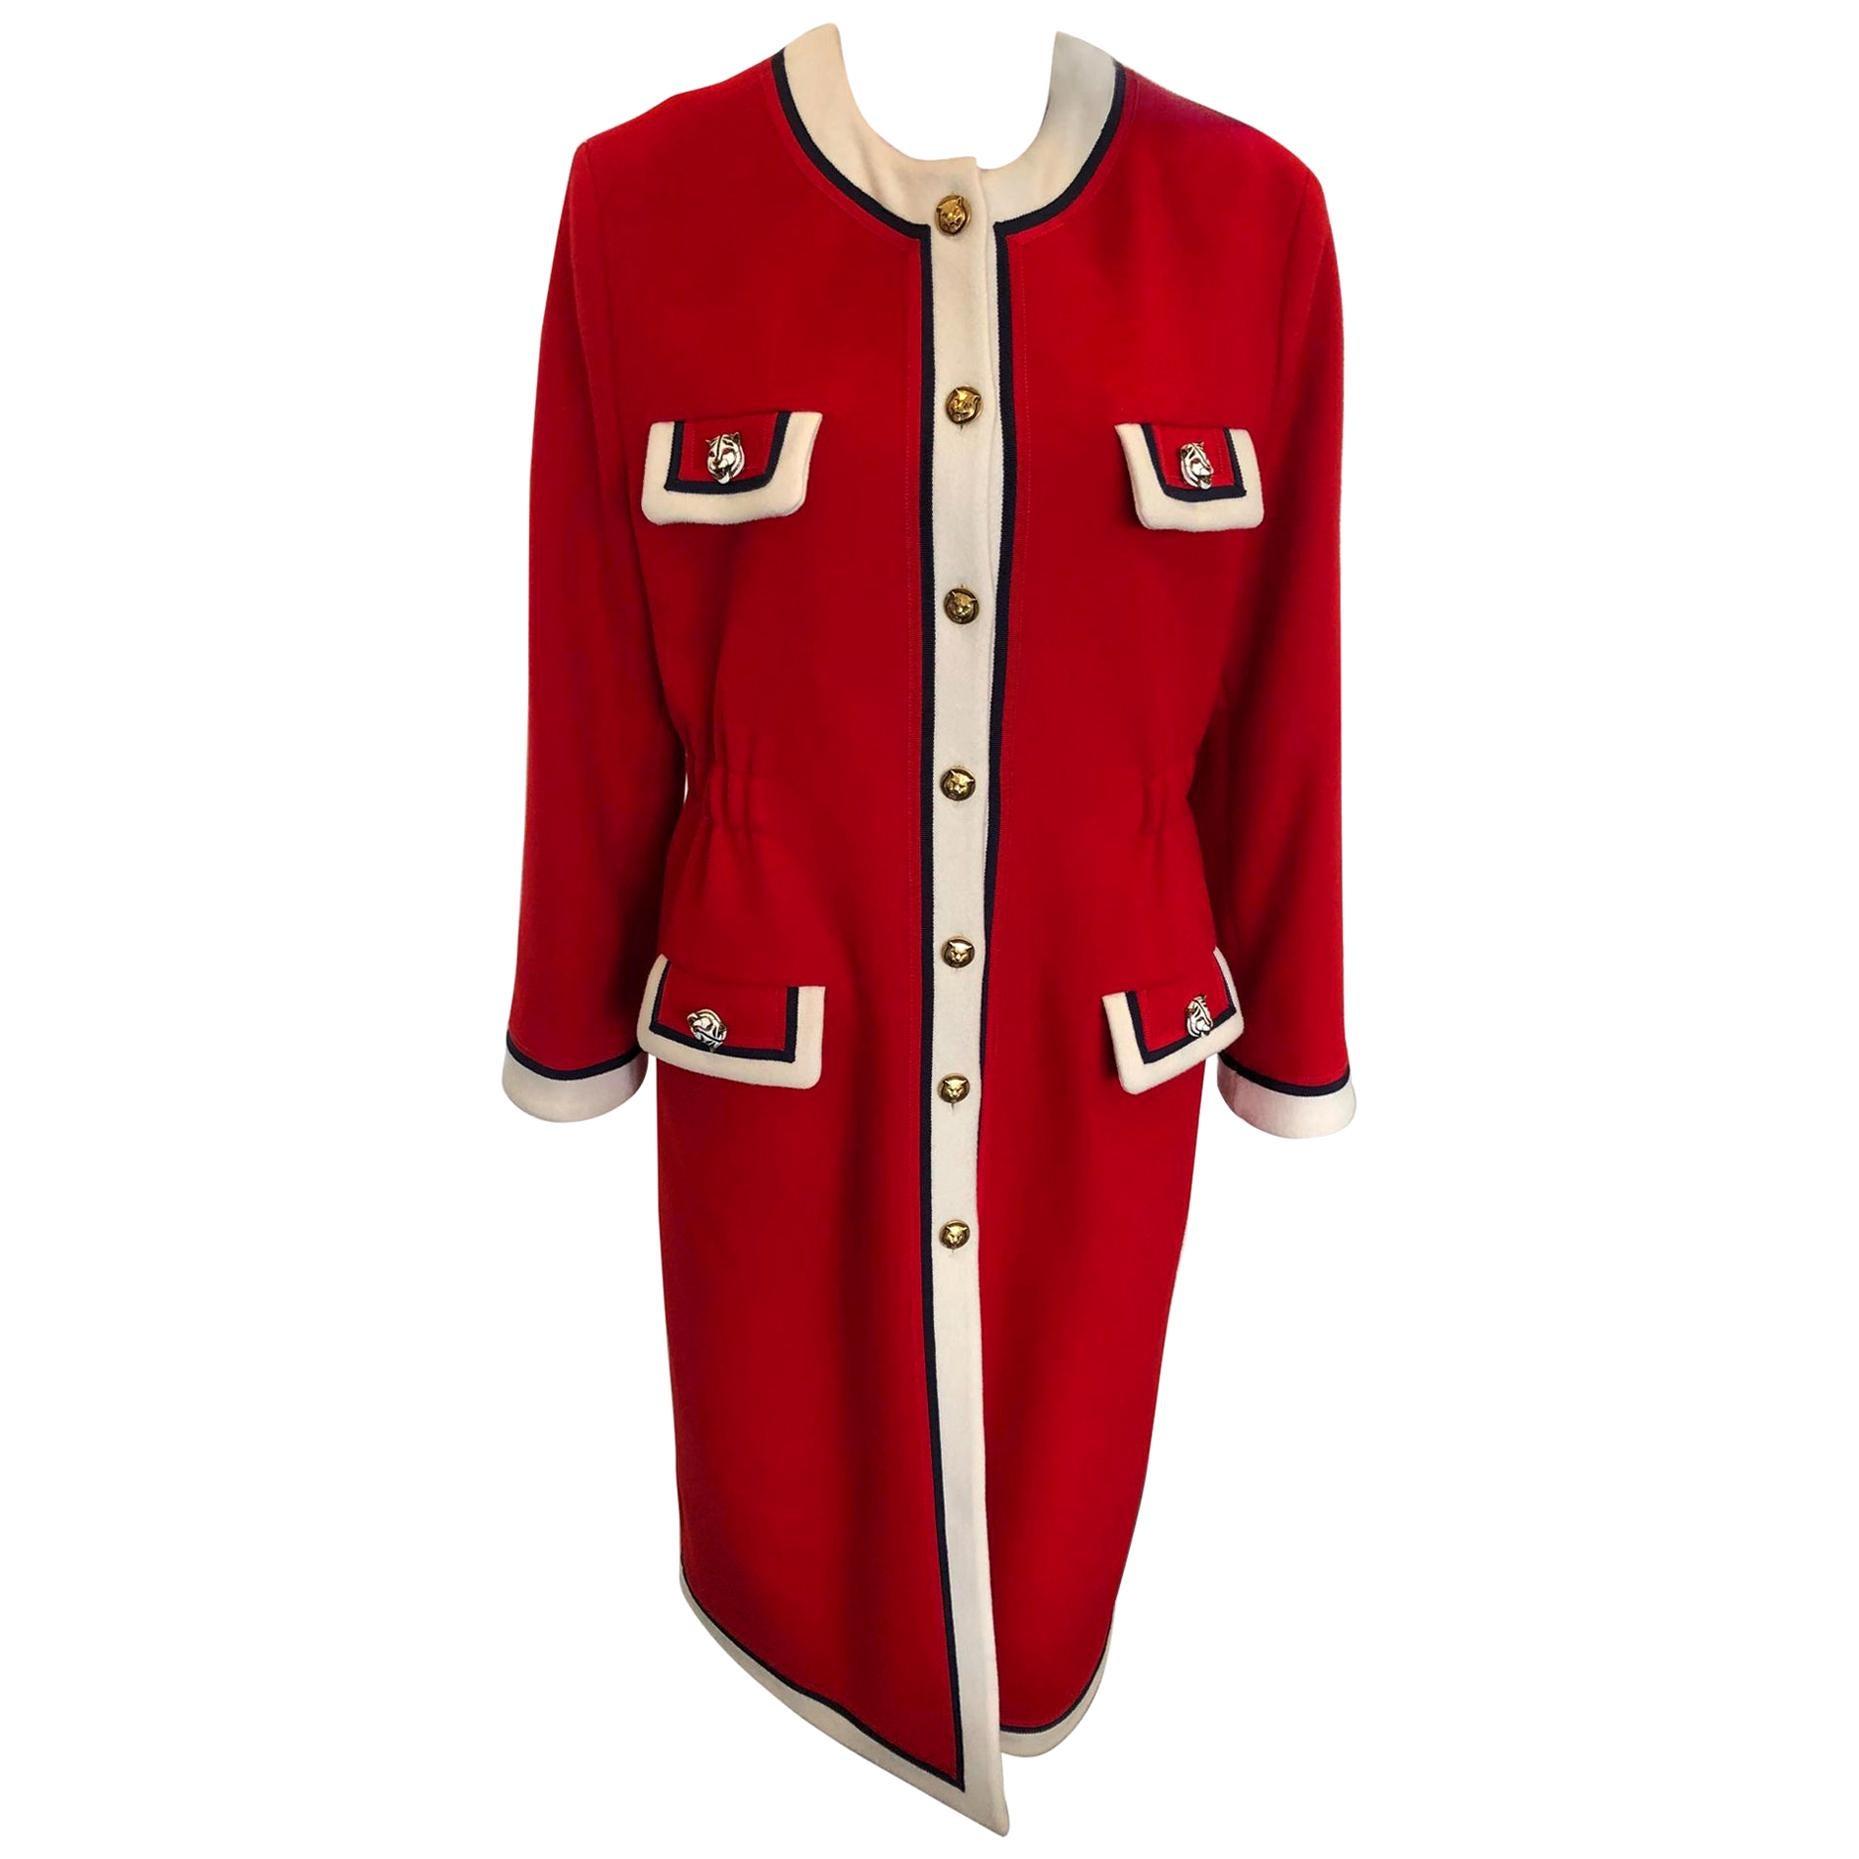 DESIGNER GUCCI Long coat red - 48